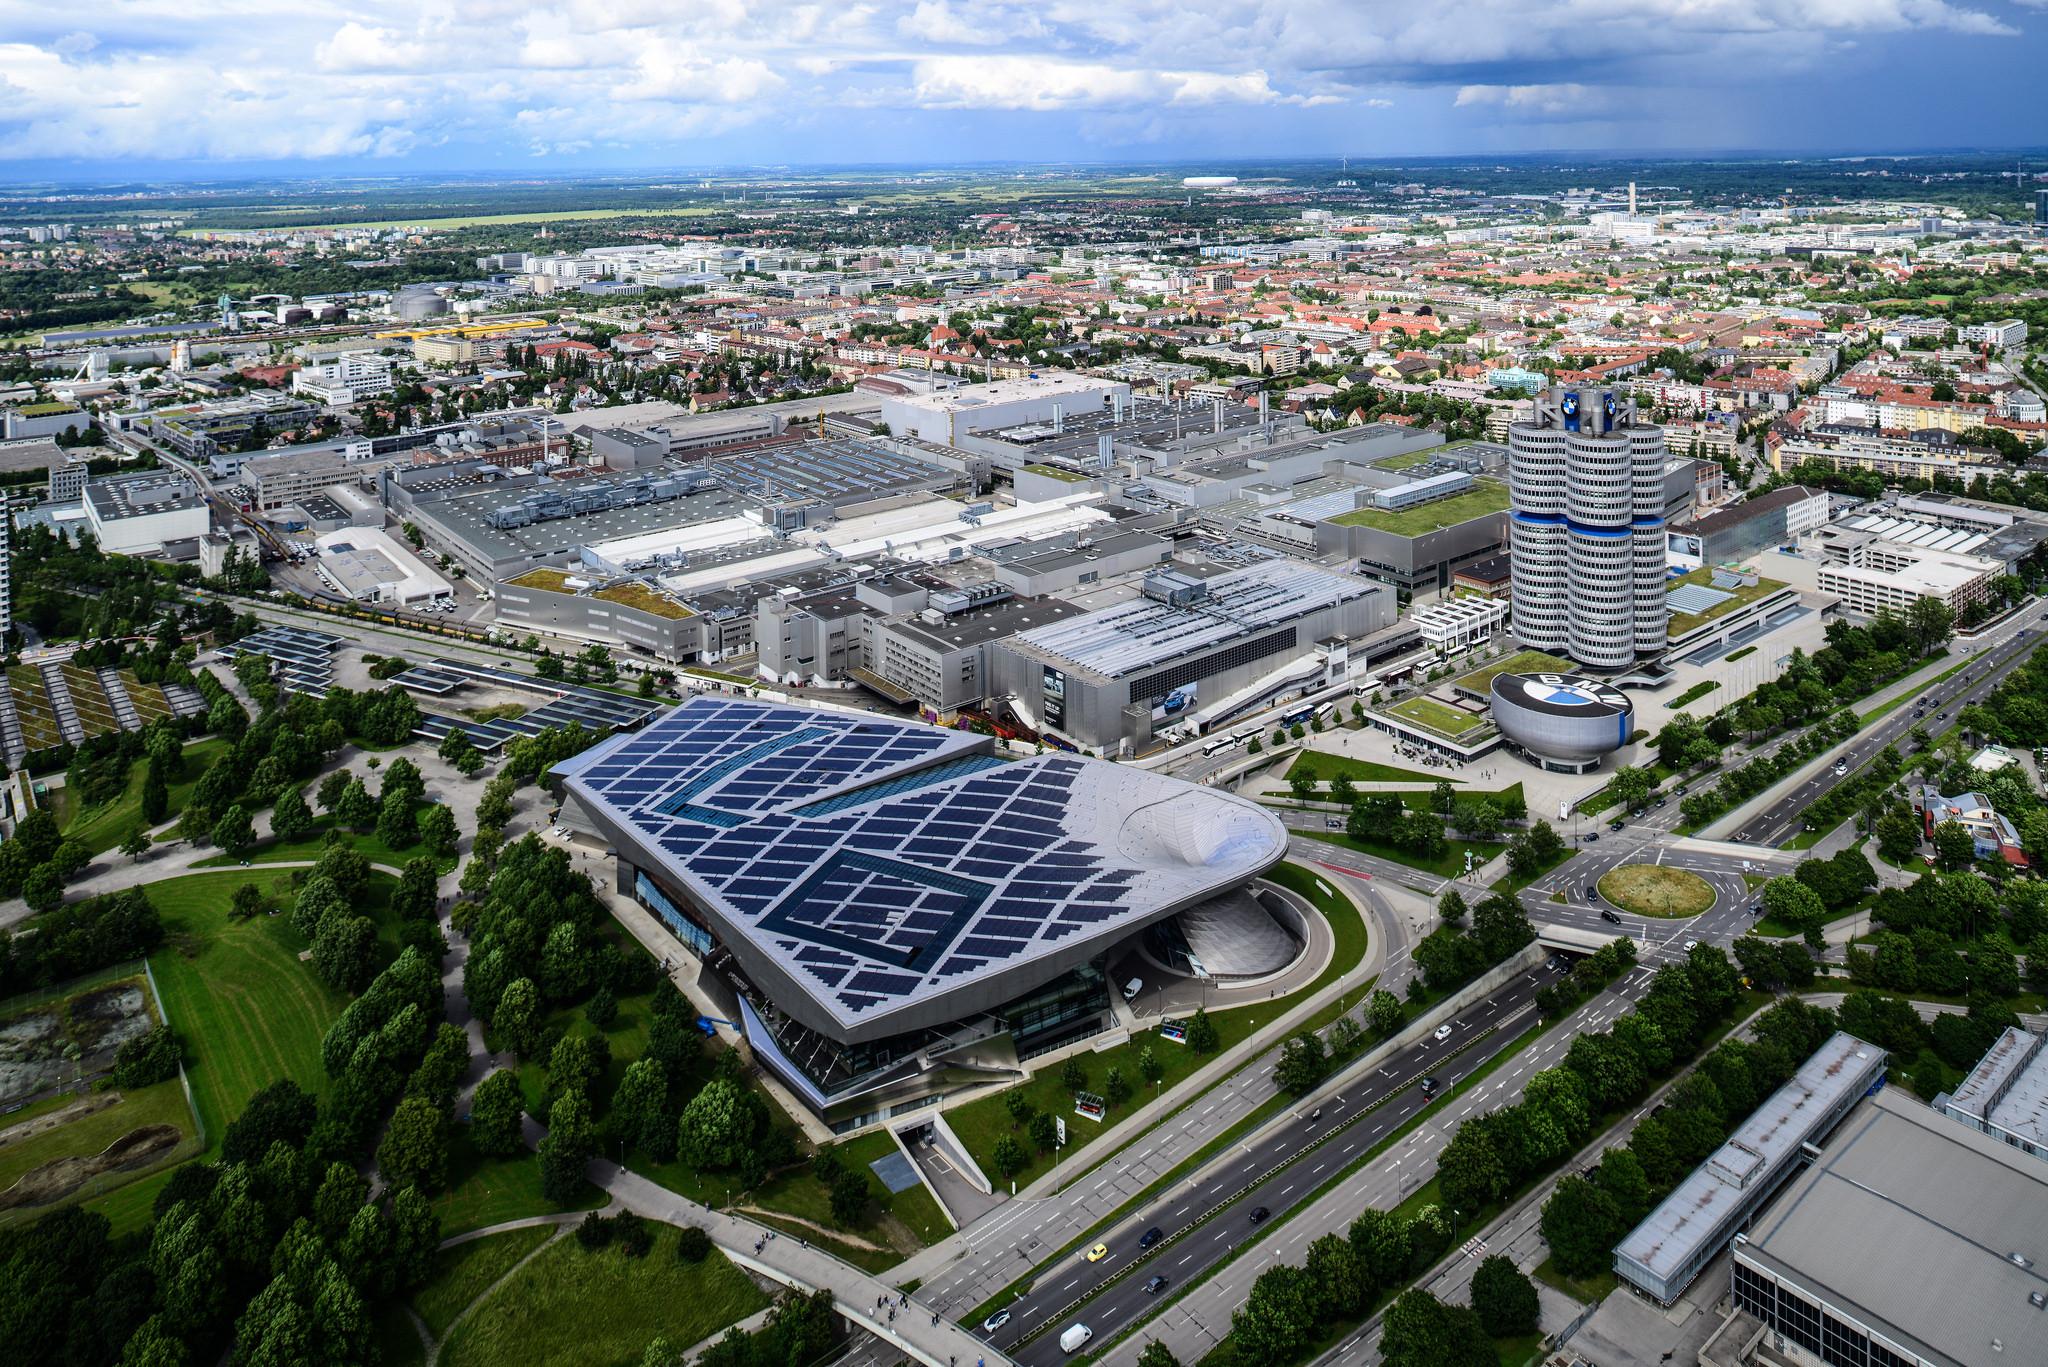 BMW headquarters aerial view